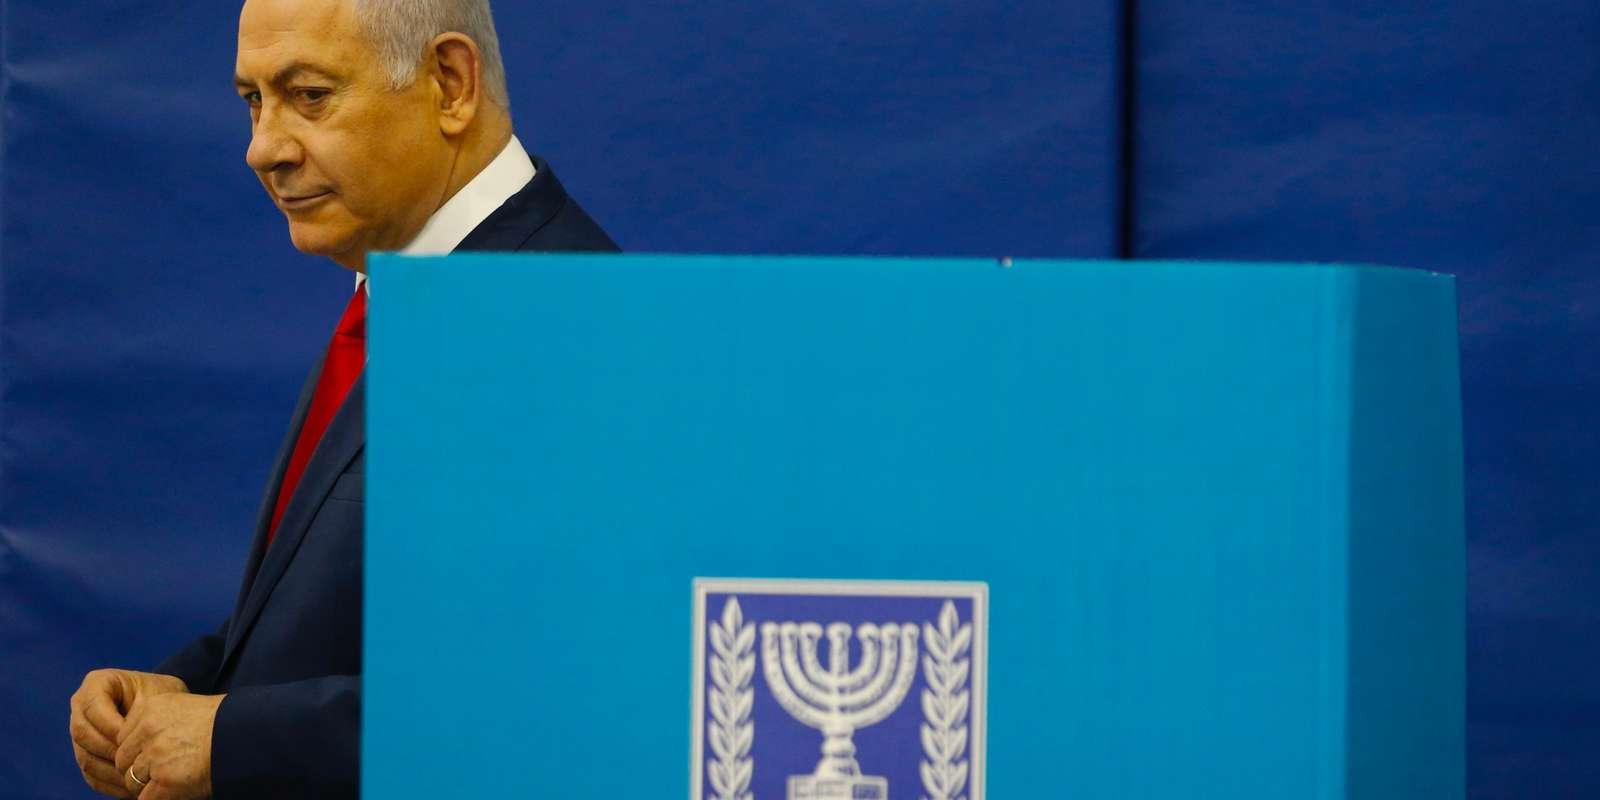 Législatives en Israël: Benyamin Netanyahu et Benny Gantz au coude-à-coude